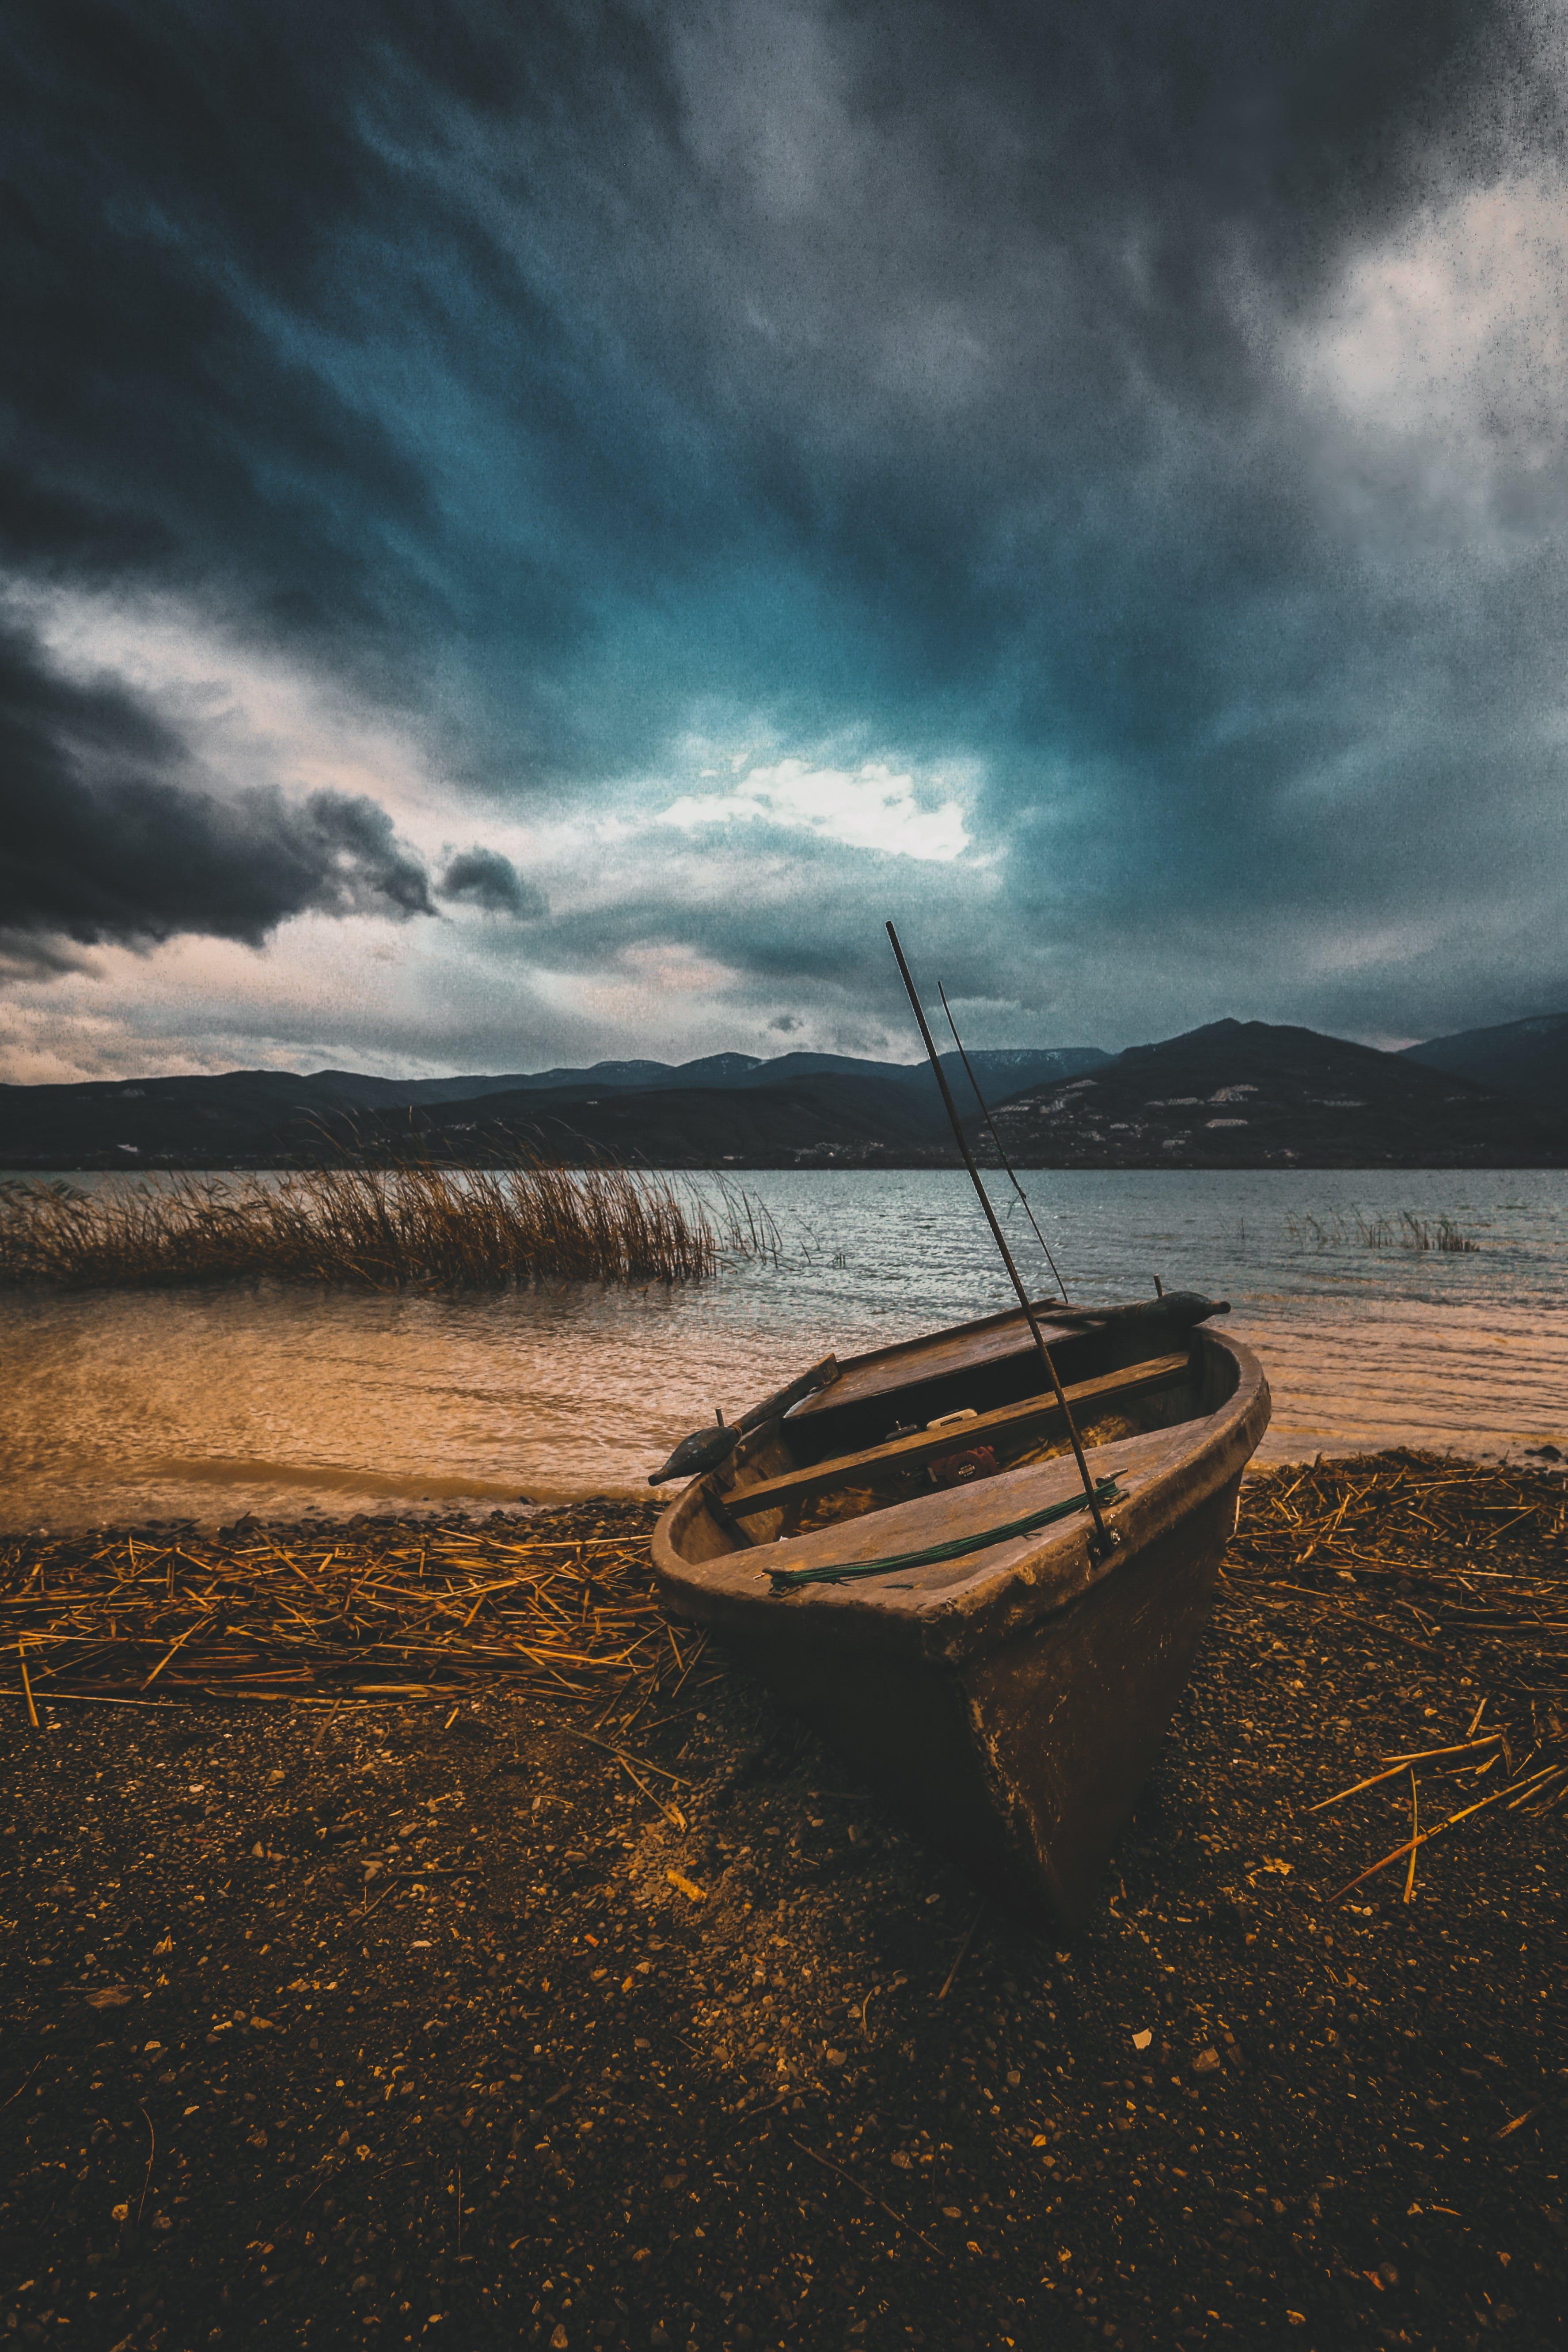 cloudscape, ゴールデンアワー, ボート, 交通機関の無料の写真素材